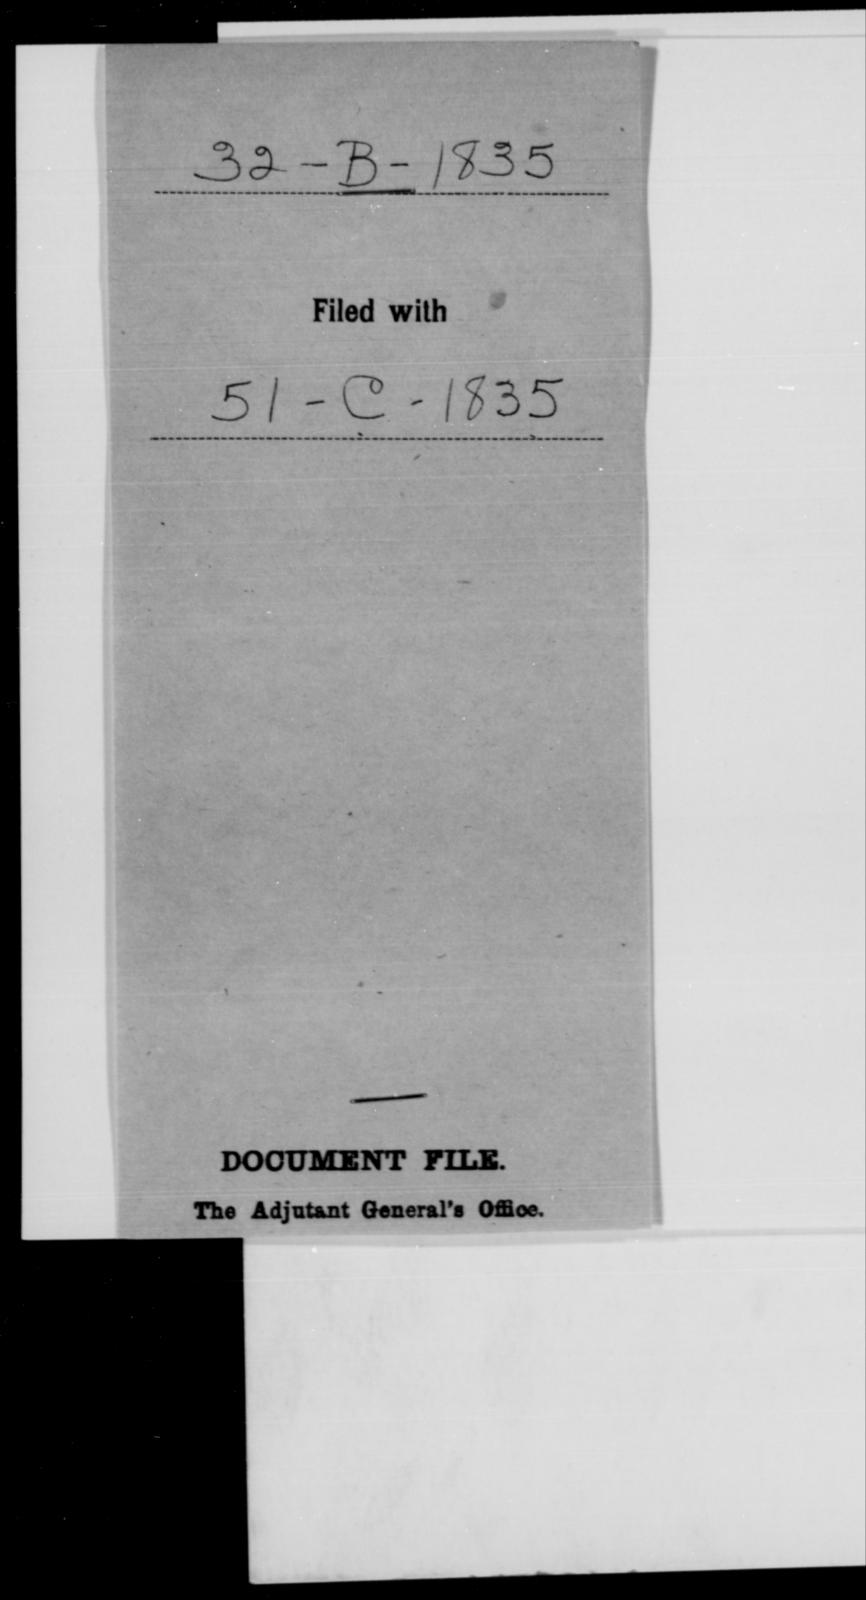 [Blank], [Blank] - State: [Blank] - Year: 1835 - File Number: B32